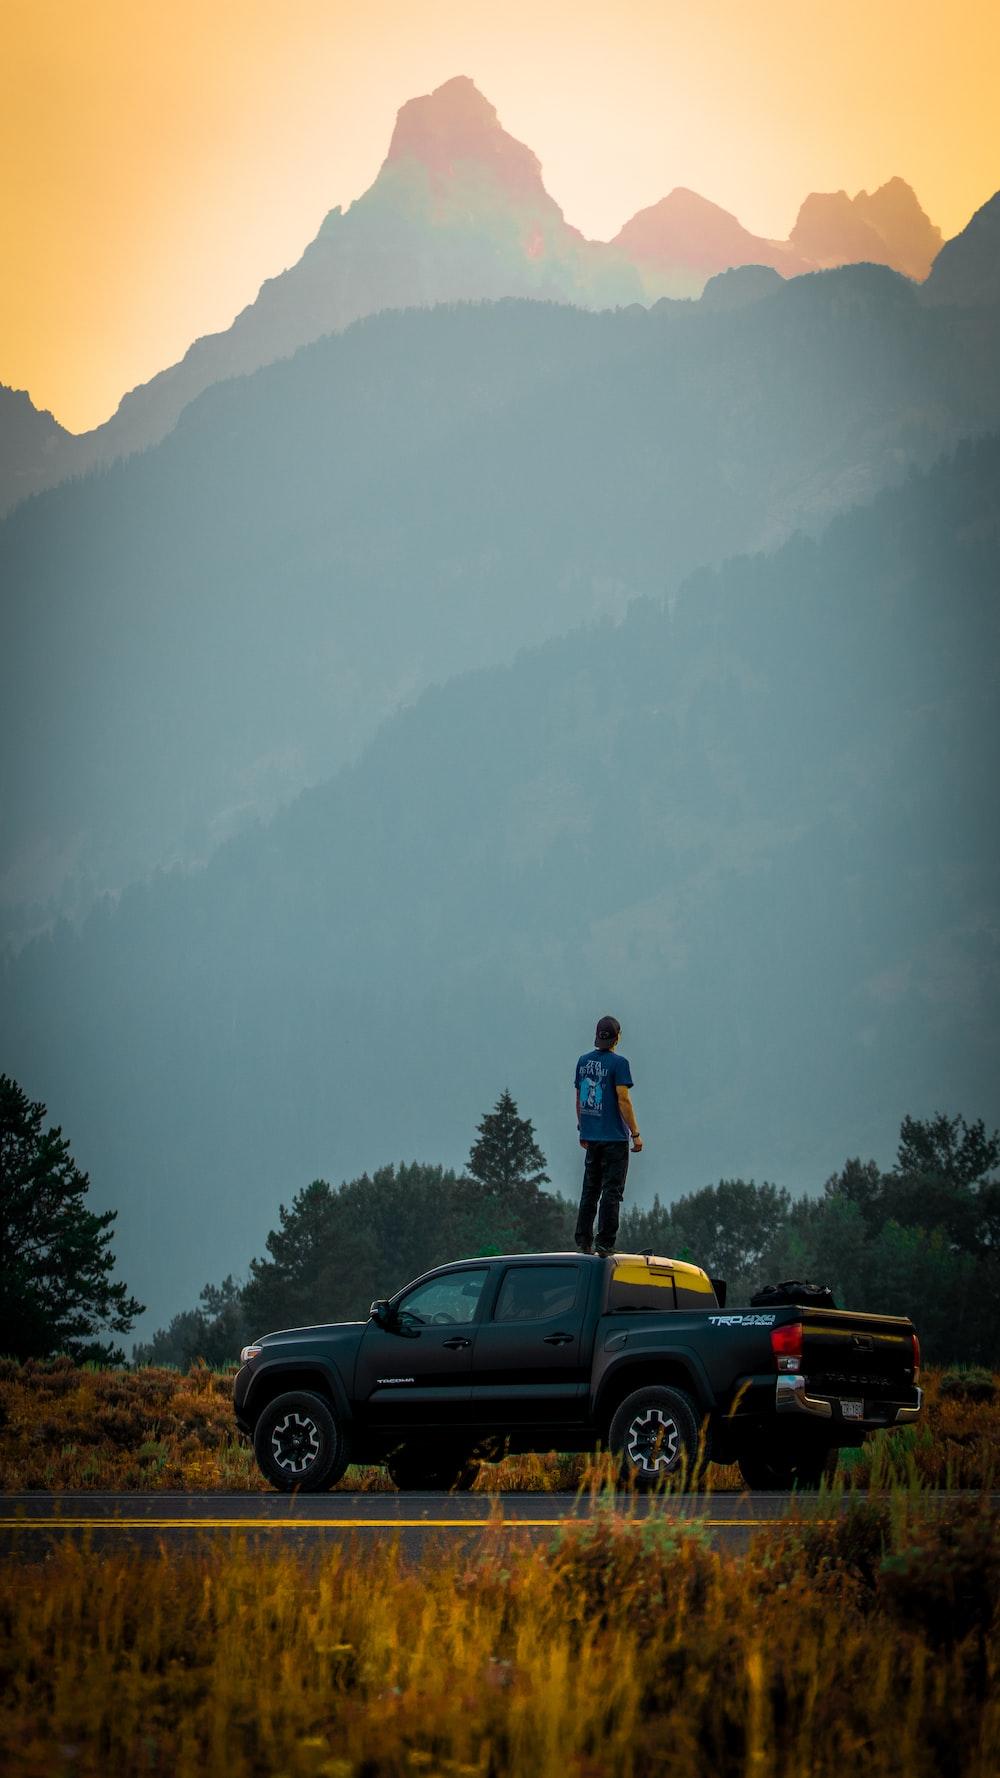 man in black jacket standing on yellow car during daytime